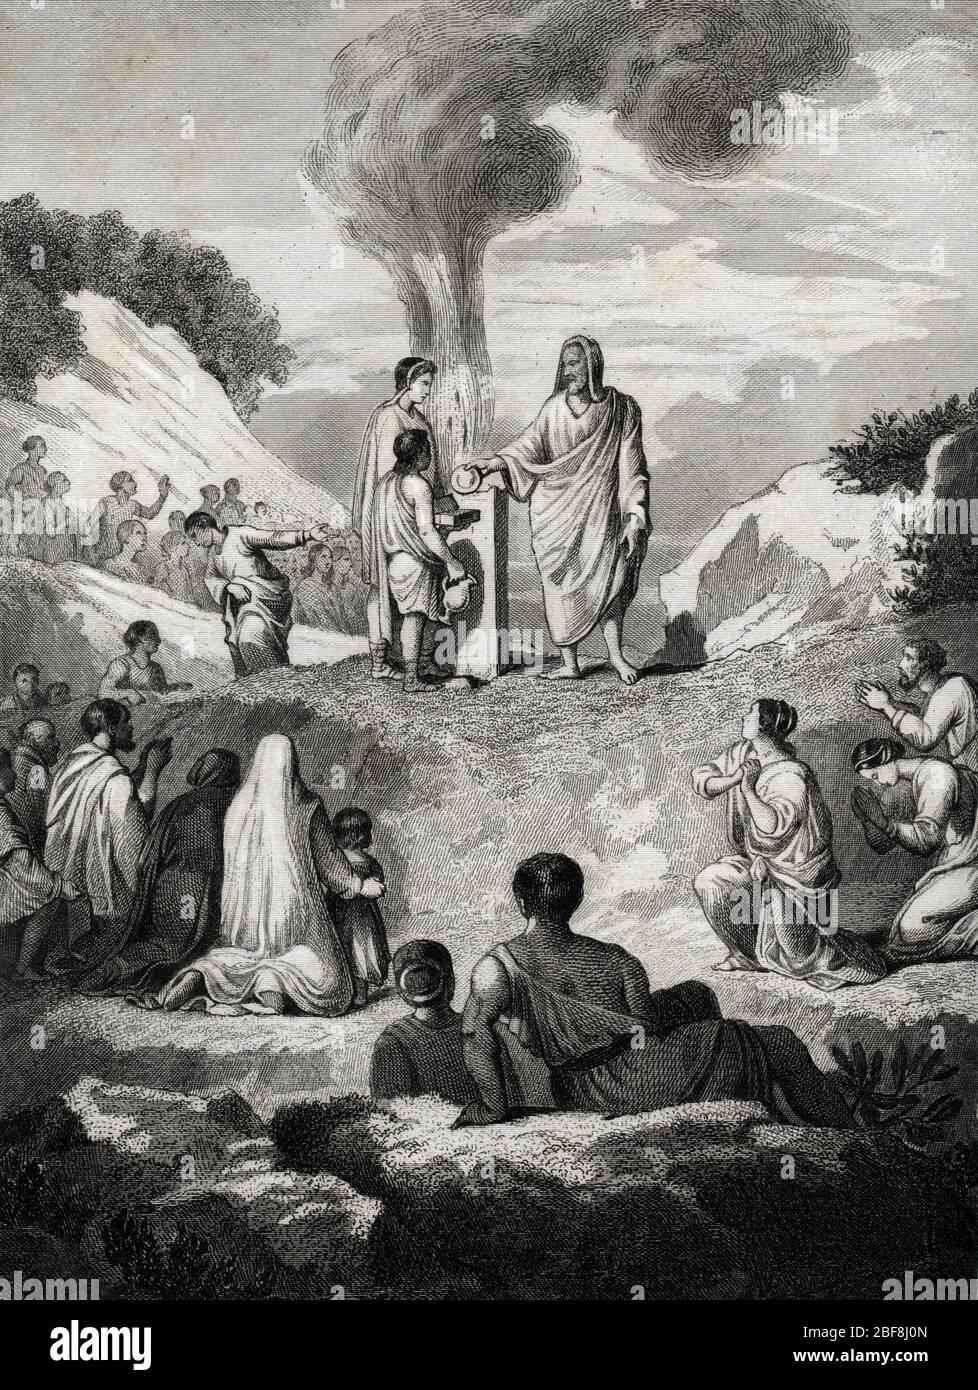 Zoroastrisme - mazdeisme : le culte du feu a l'epoque de la perse achemenide, 539-331 avant JC (Zoroastrianism - Mazdayasna : fire celebration at the Stock Photo